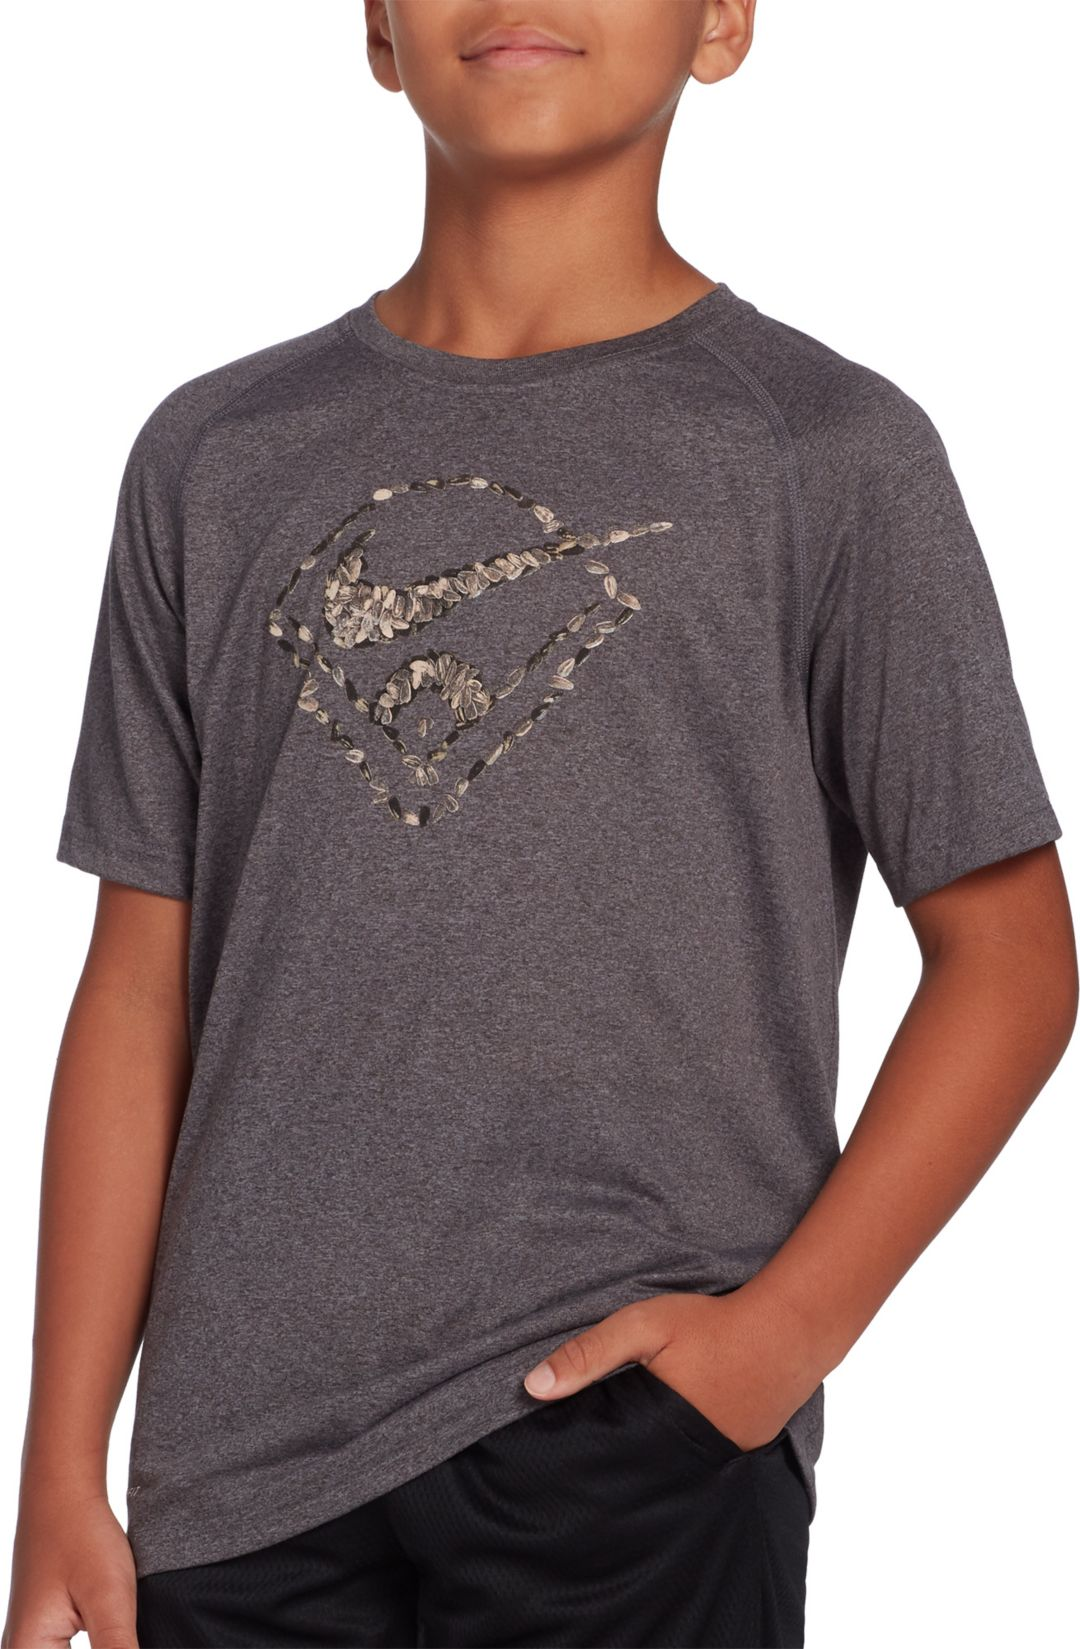 254eaf29b Nike Boys' Dri-FIT Sunflower Seeds Raglan T-Shirt | DICK'S Sporting ...